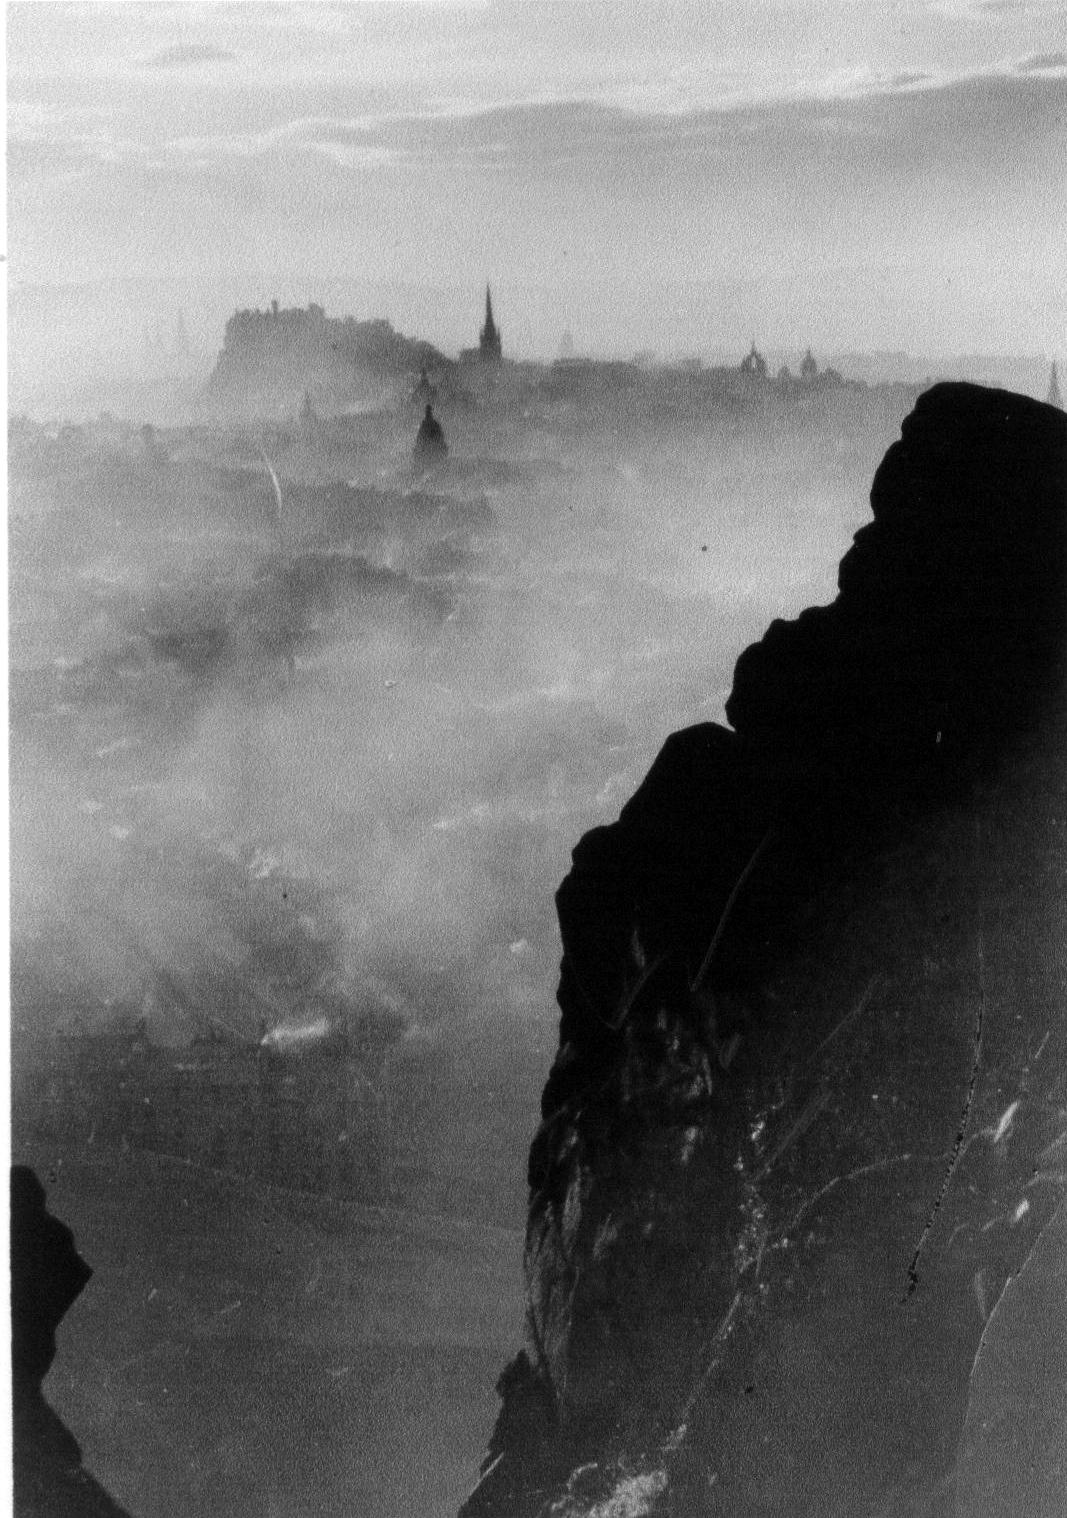 Edinburgh From 'Cat's Nick' on Salisbury Crags 1950s